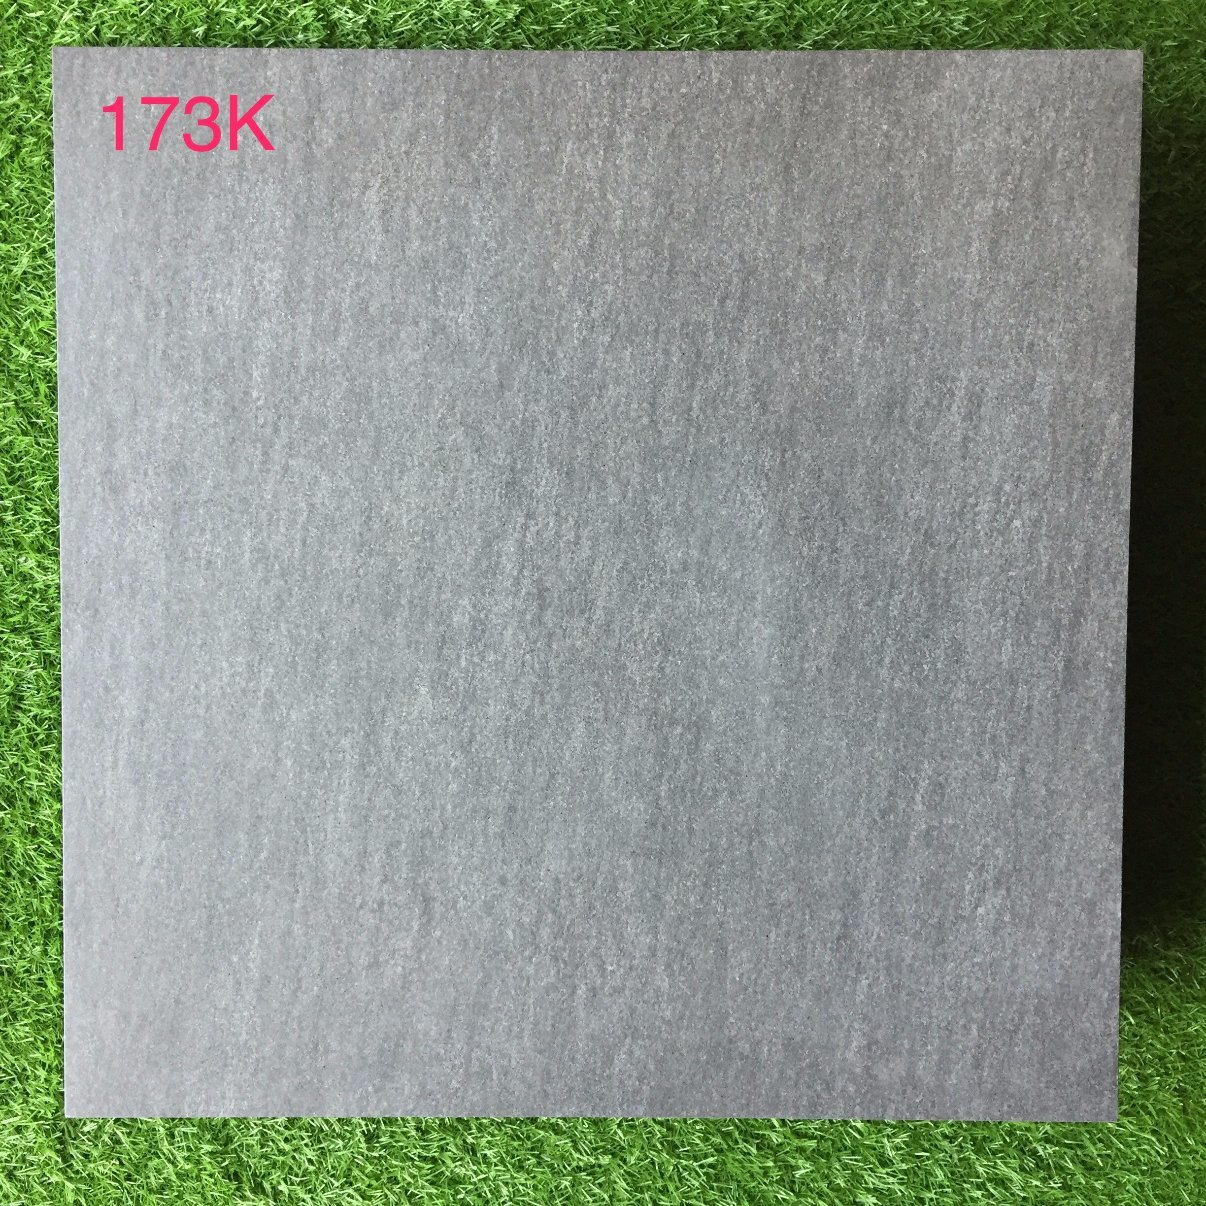 China Foshan Factory 2cm Outdoor Porcelain Tile Porcelain Floor